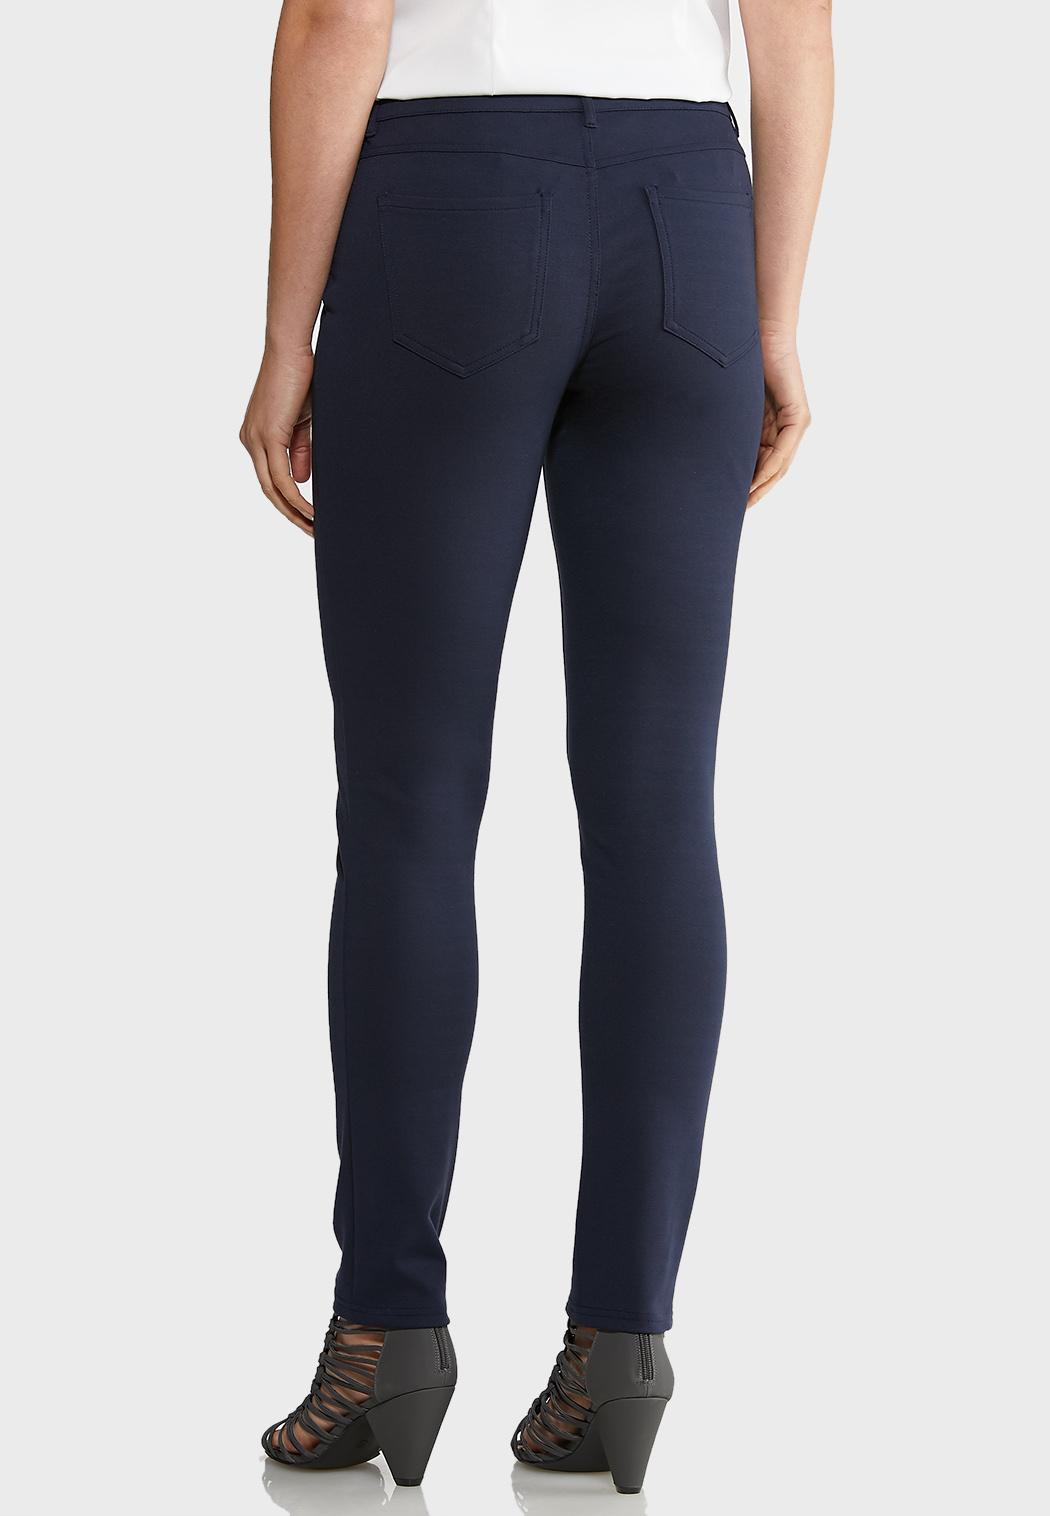 Petite Skinny Leg Ponte Pants (Item #43917706)